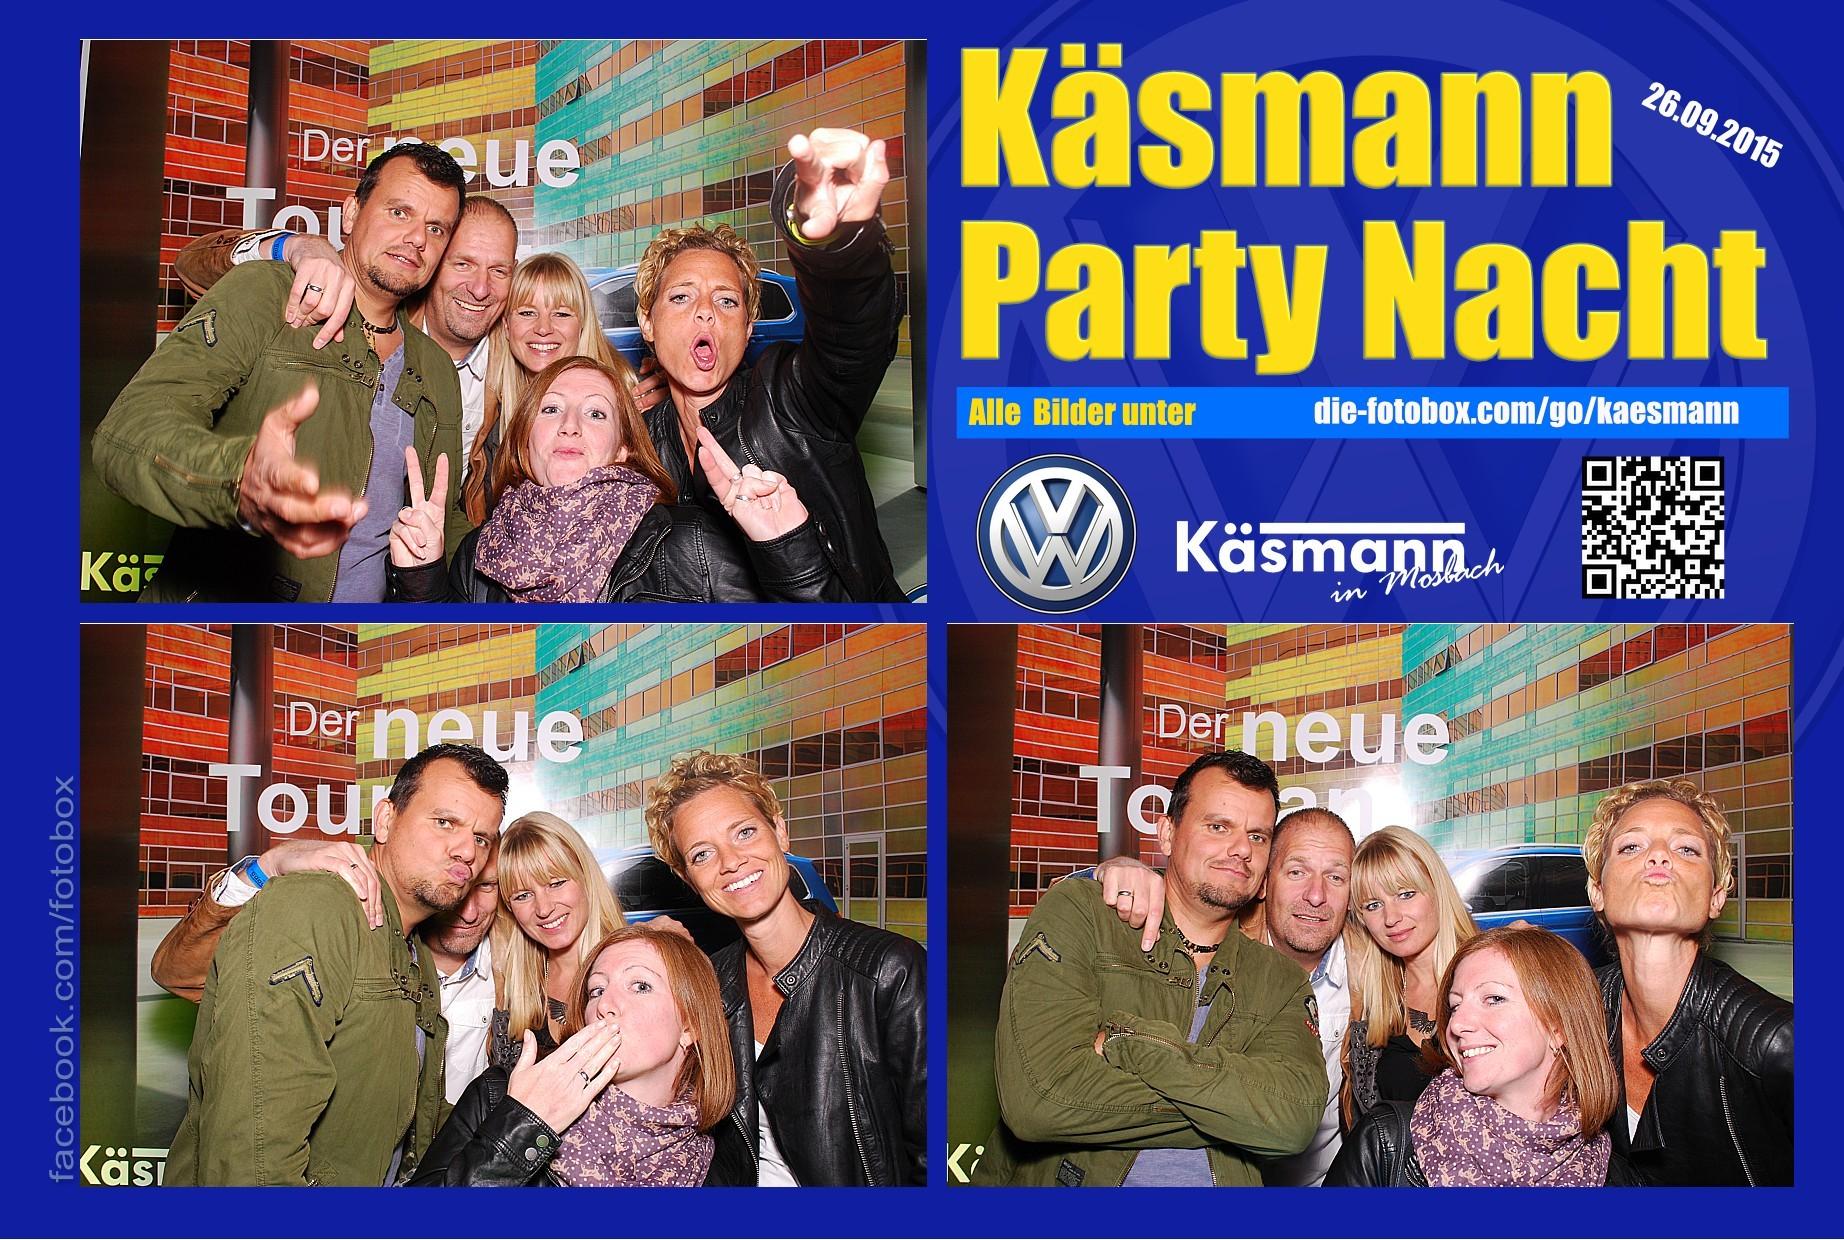 Käsmannparty 2015 - www.die-fotobox.com 01288